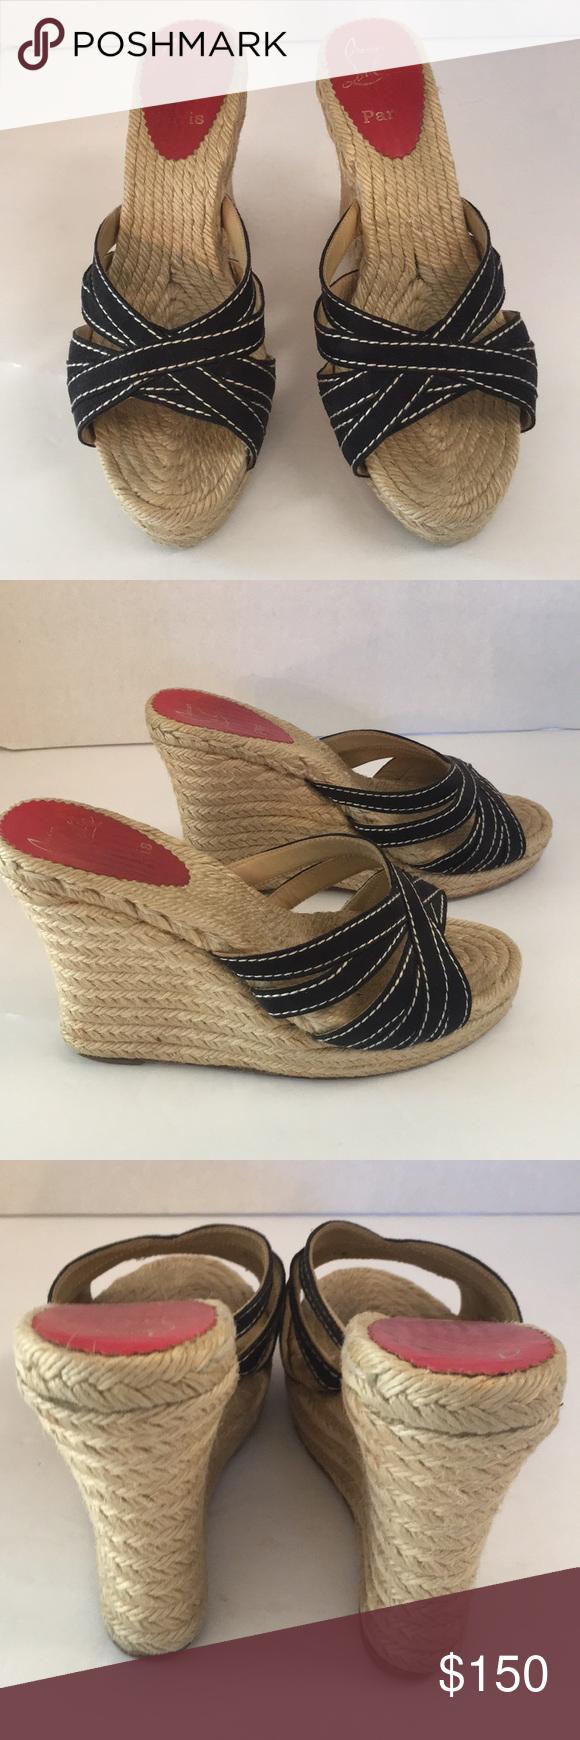 0ba313eb46b Christian Louboutin black espadrille wedge sandals Nice pair of ...